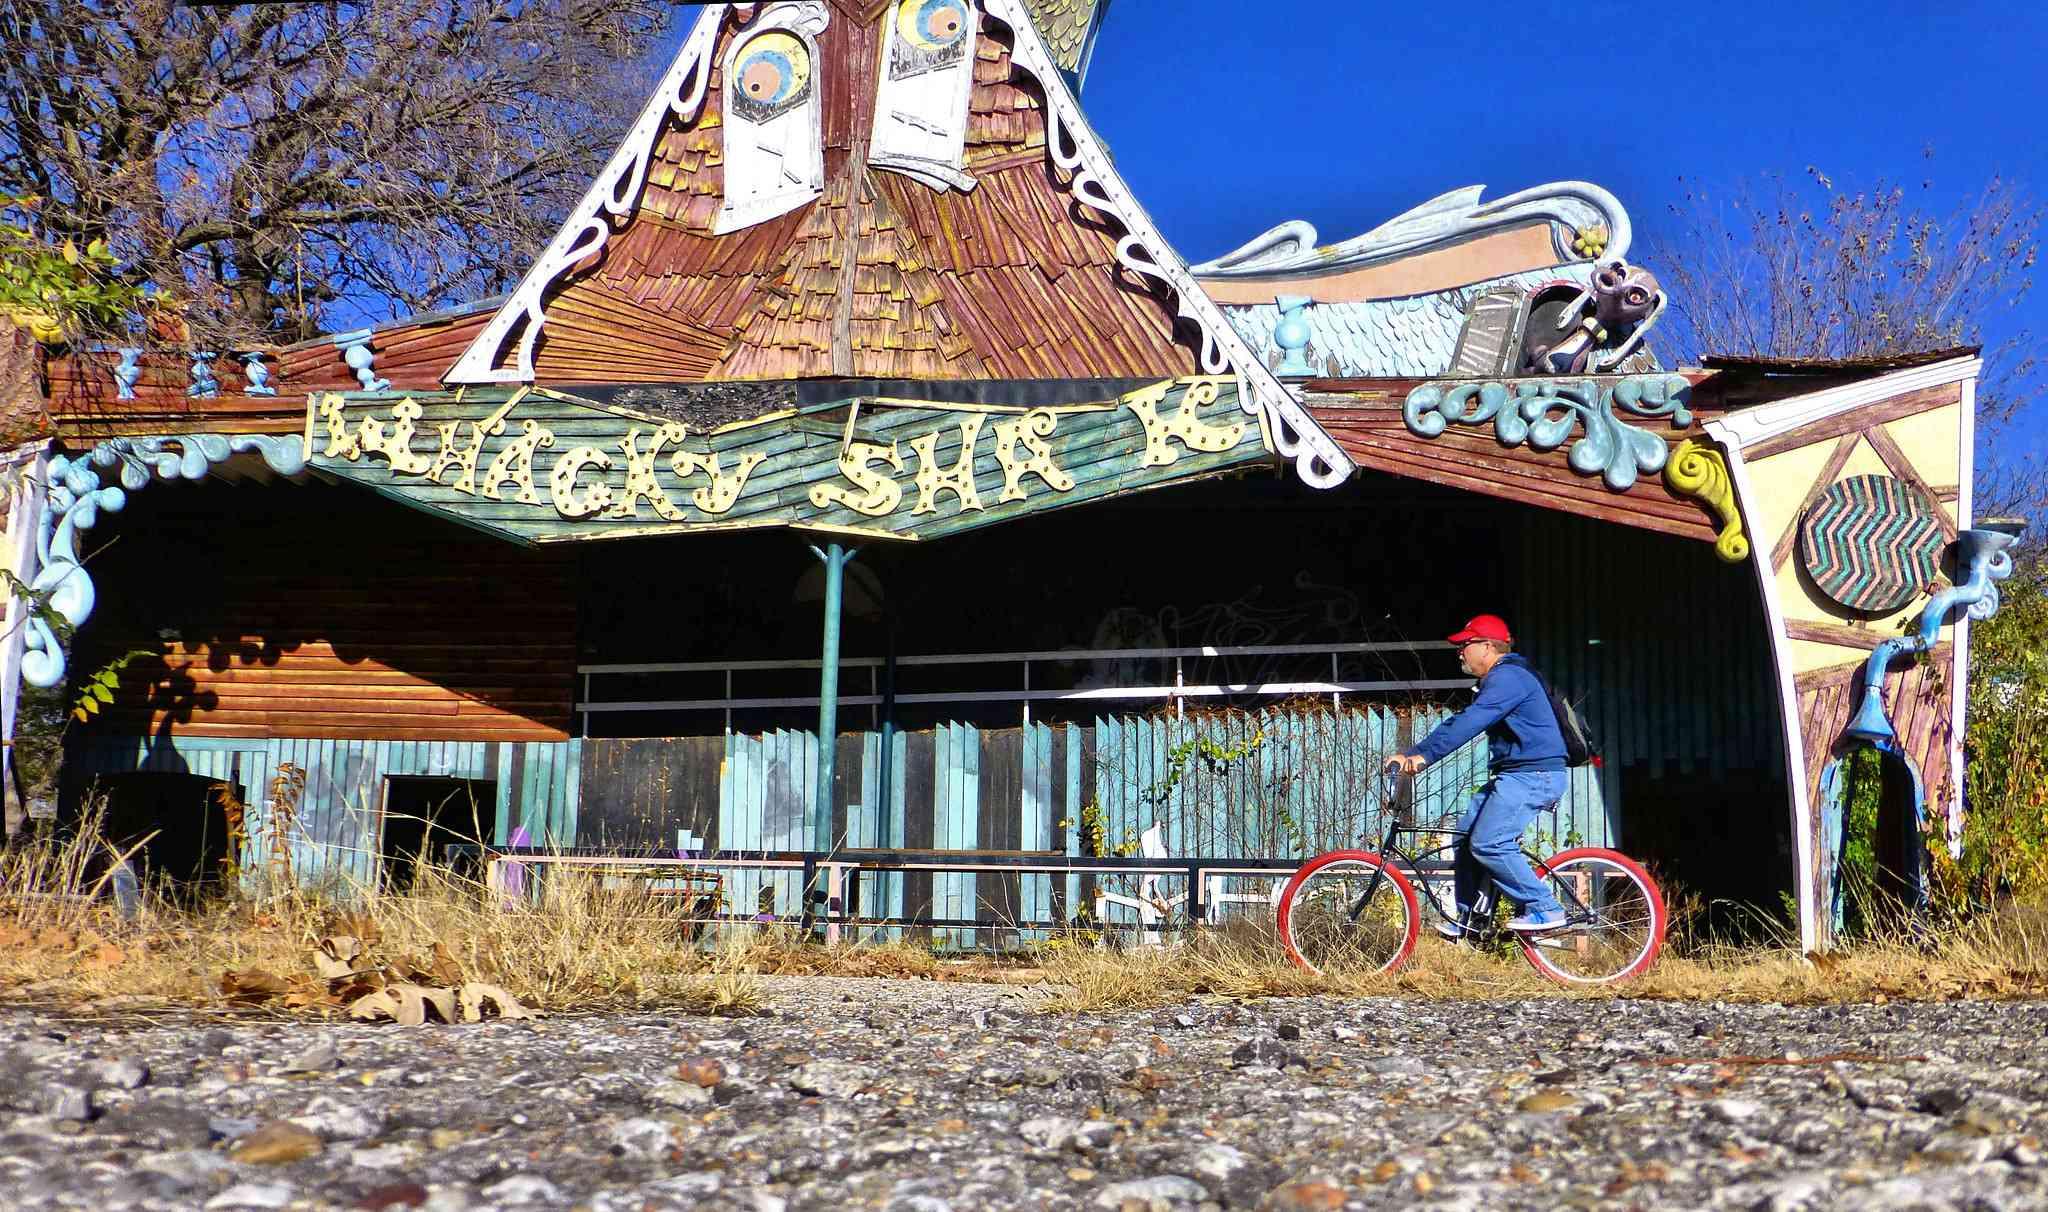 Whacky Shack ride at abandoned Joyland amusement par